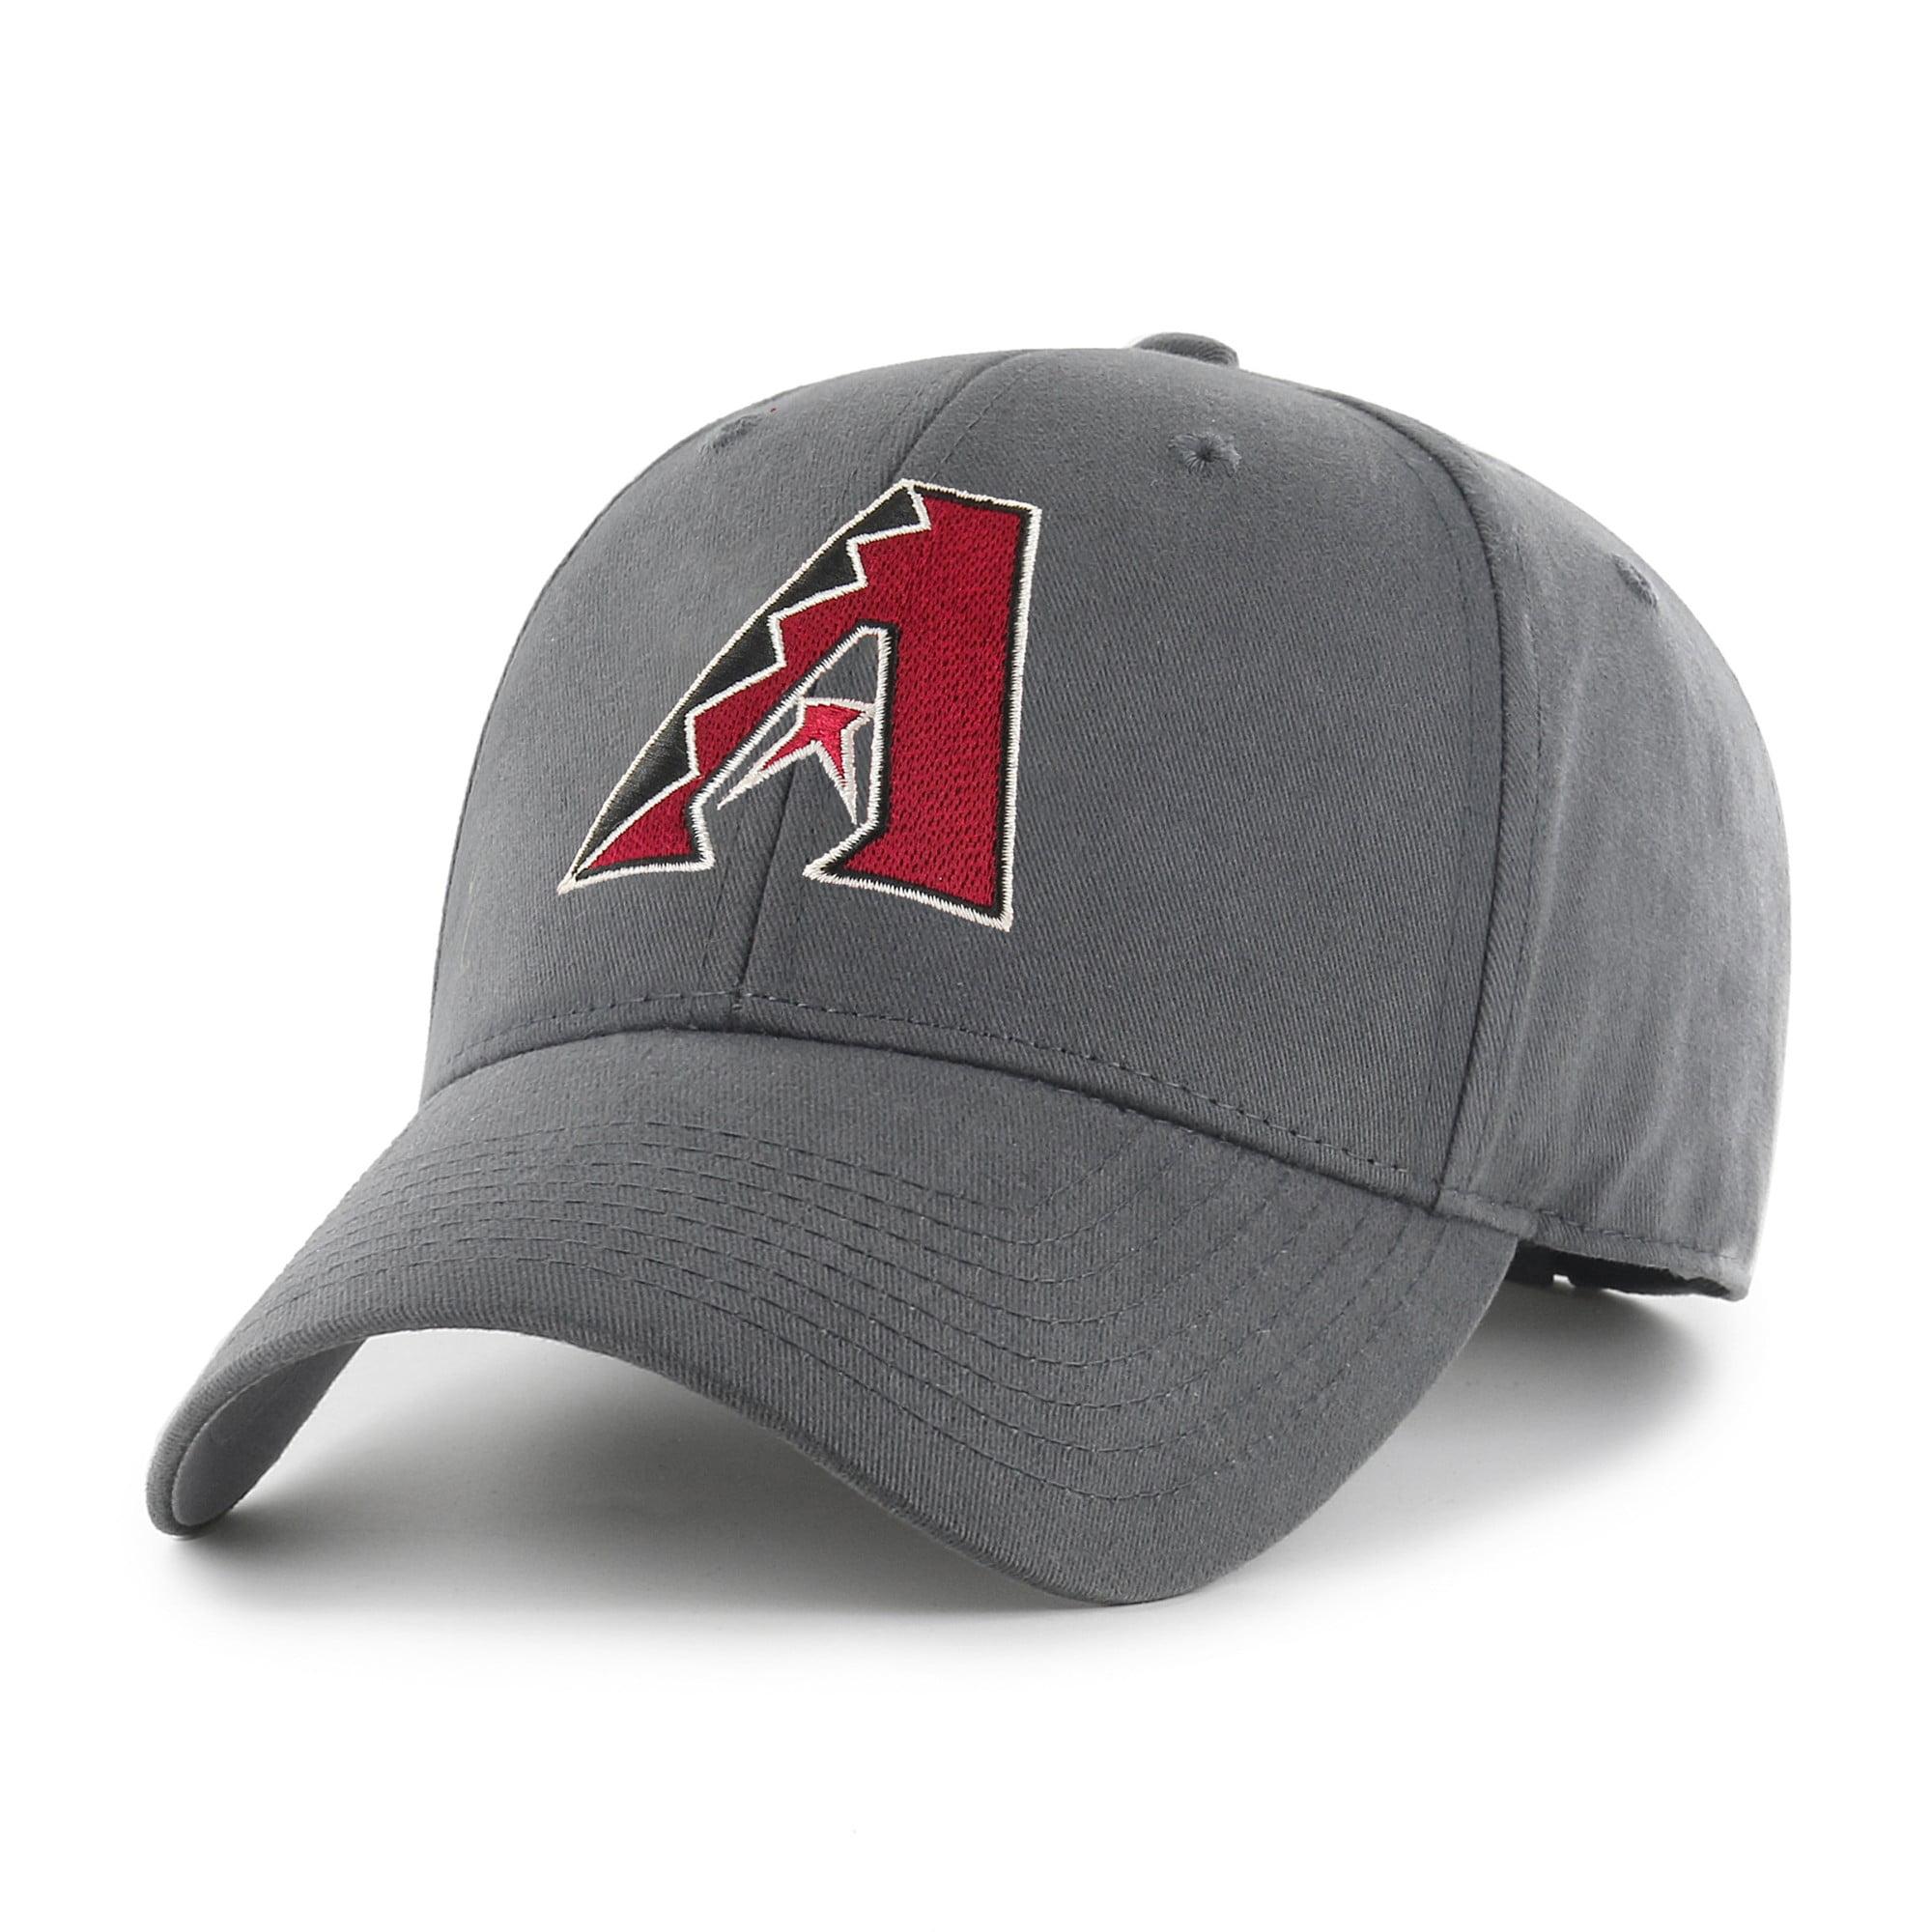 huge selection of 4351f ce7a7 Arizona Diamondbacks Team Shop - Walmart.com